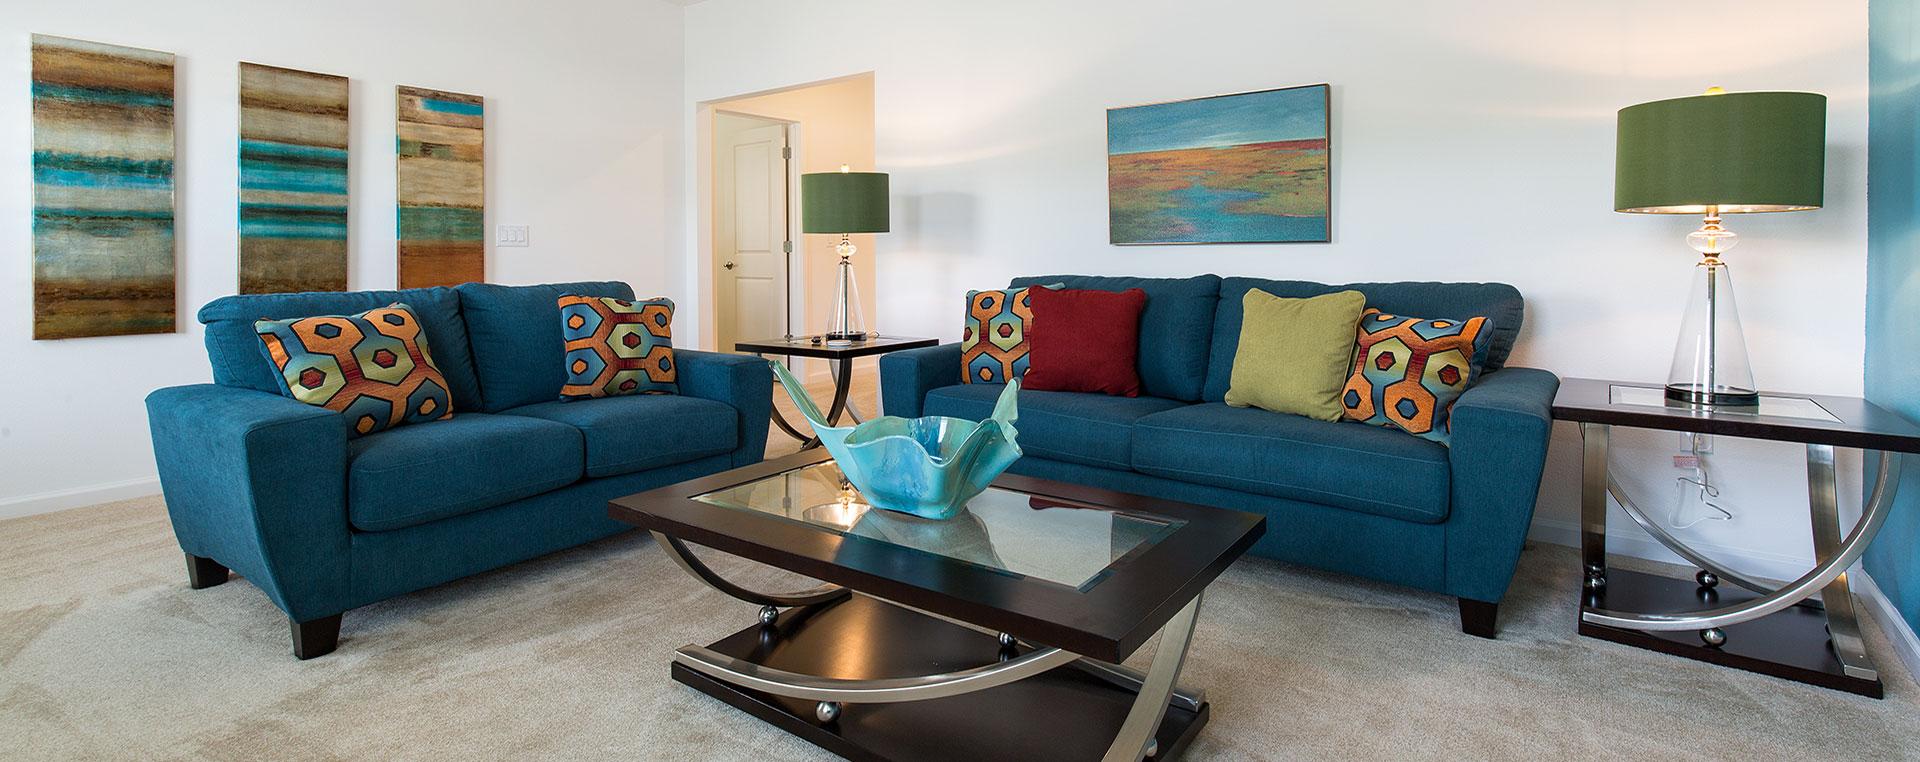 Orlando townhome rentals near disney world bella vida resort - 4 bedroom condos near disney world ...